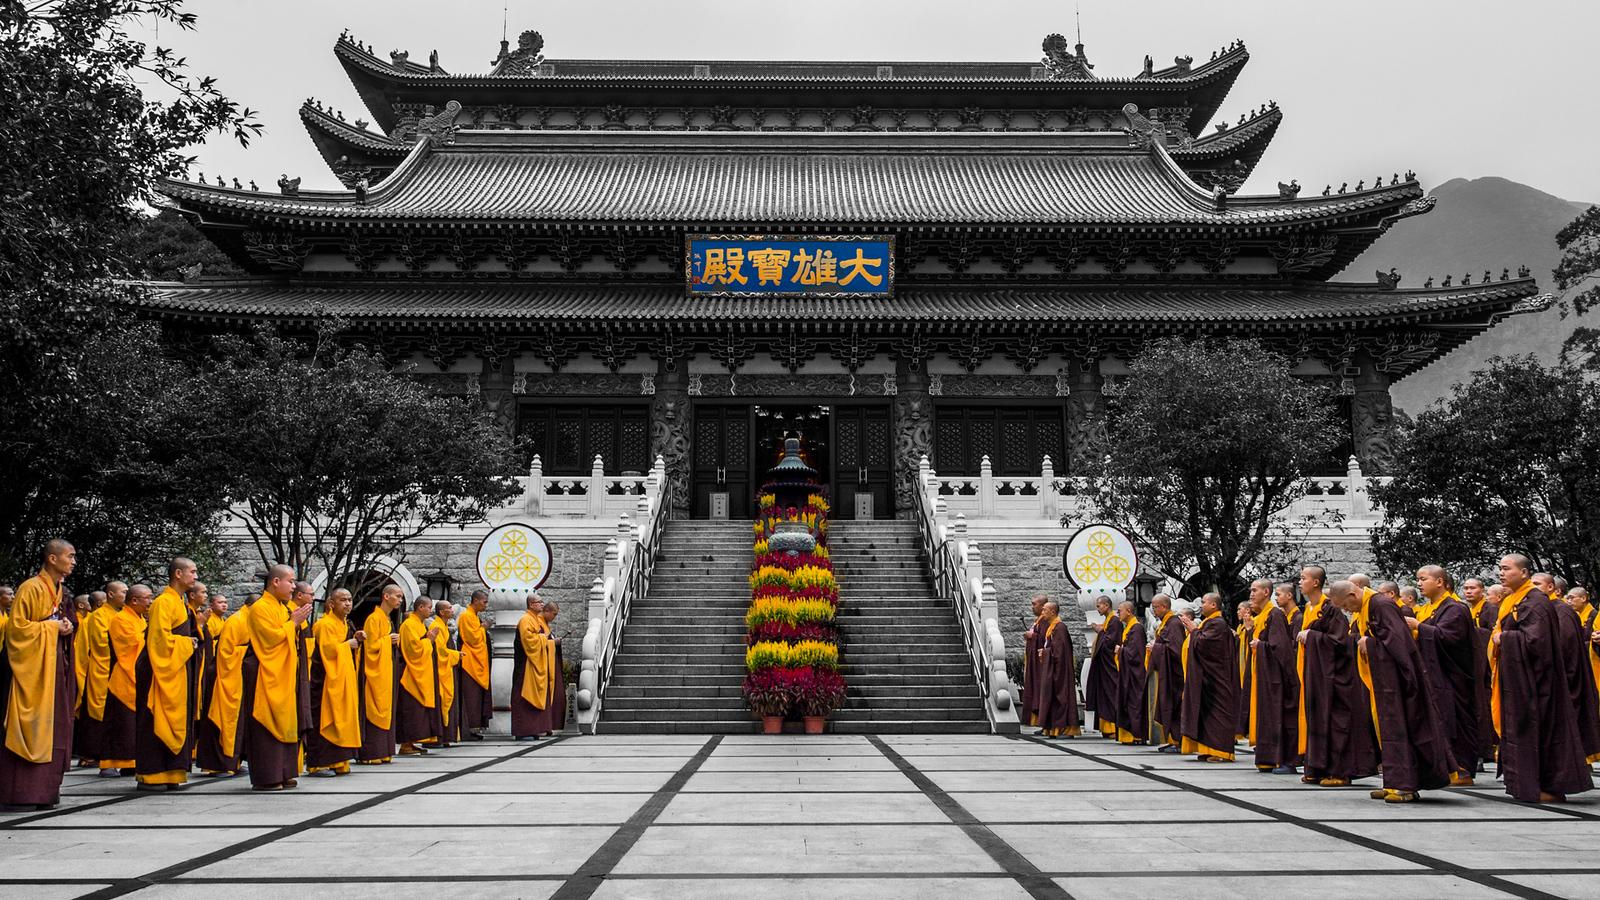 Monks gather for worship on Lantau Island, Hong Kong